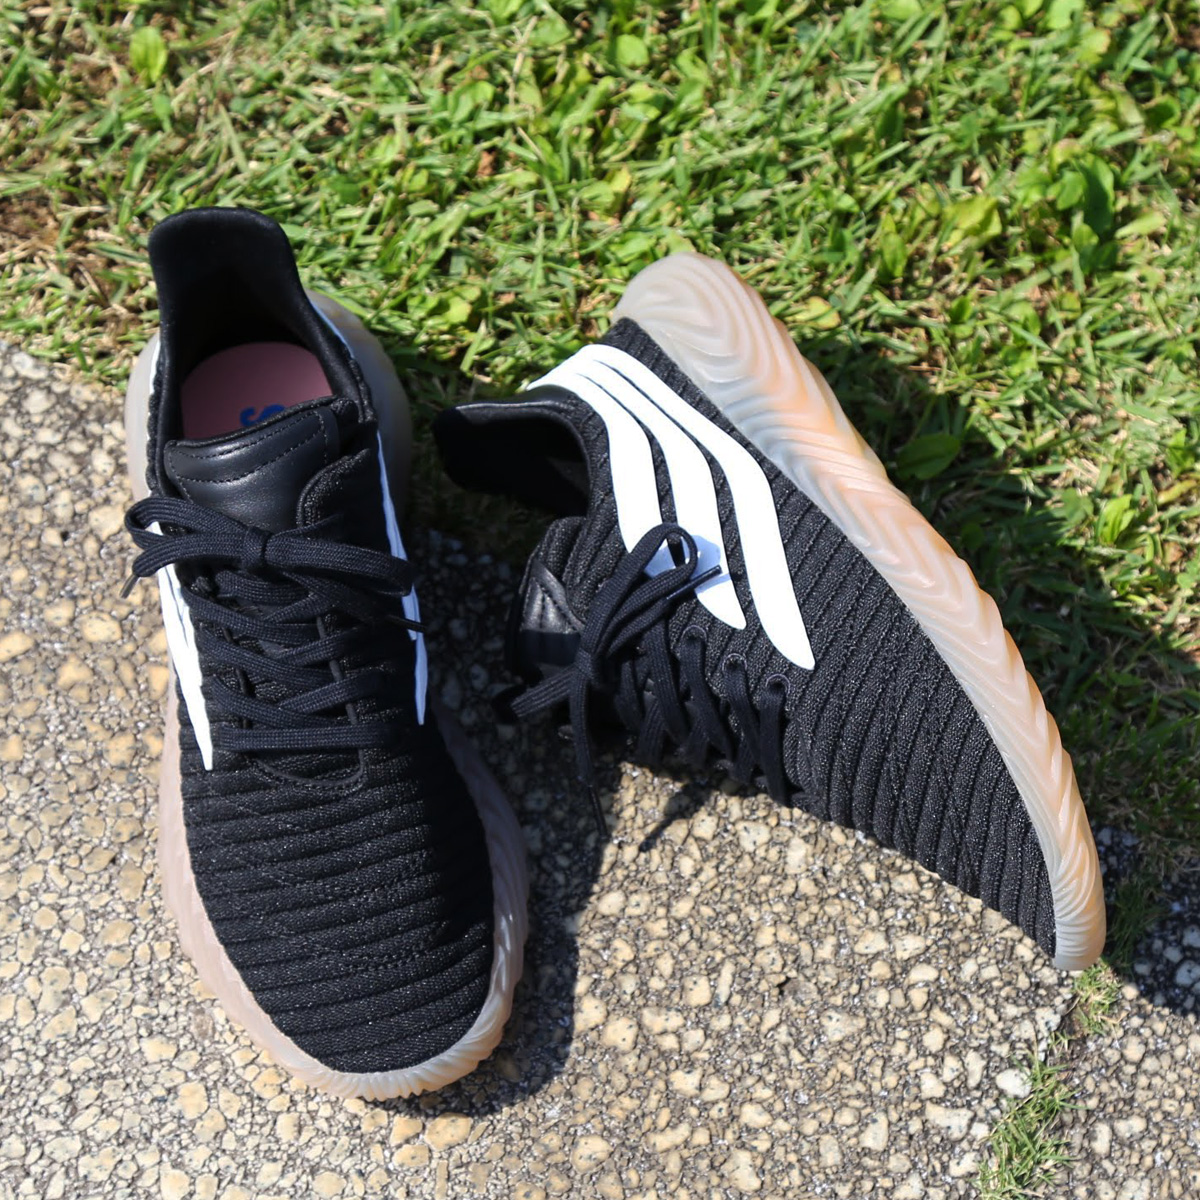 adidas Originals Sobakov(アディダス オリジナルス ソバコフ)CORE BLACK/RUNNING WHITE/GUM【メンズ スニーカー】18FW-I